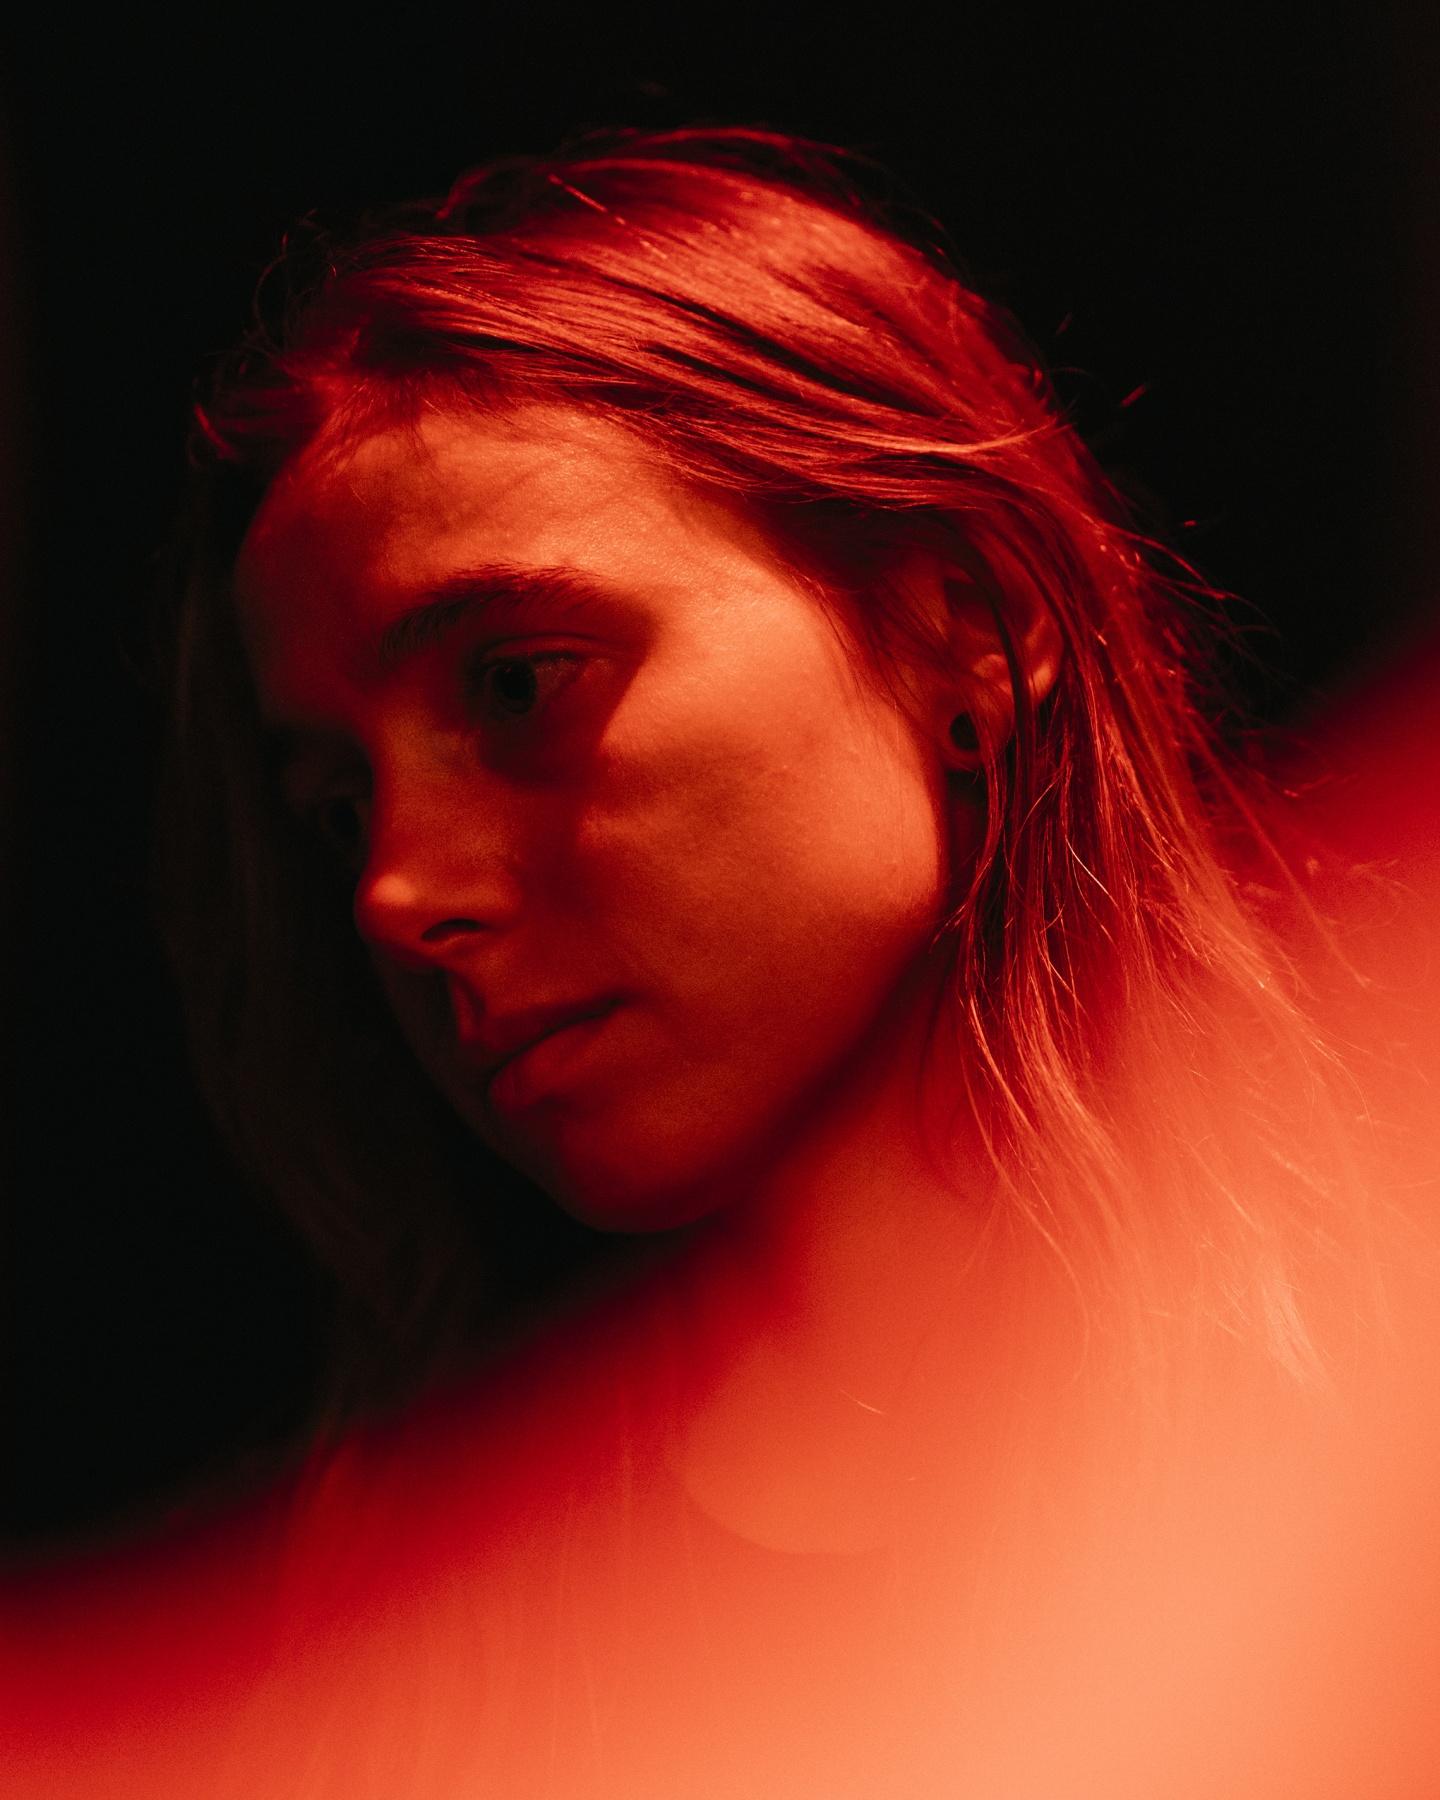 Julien Baker makes lonely songs for communal despair